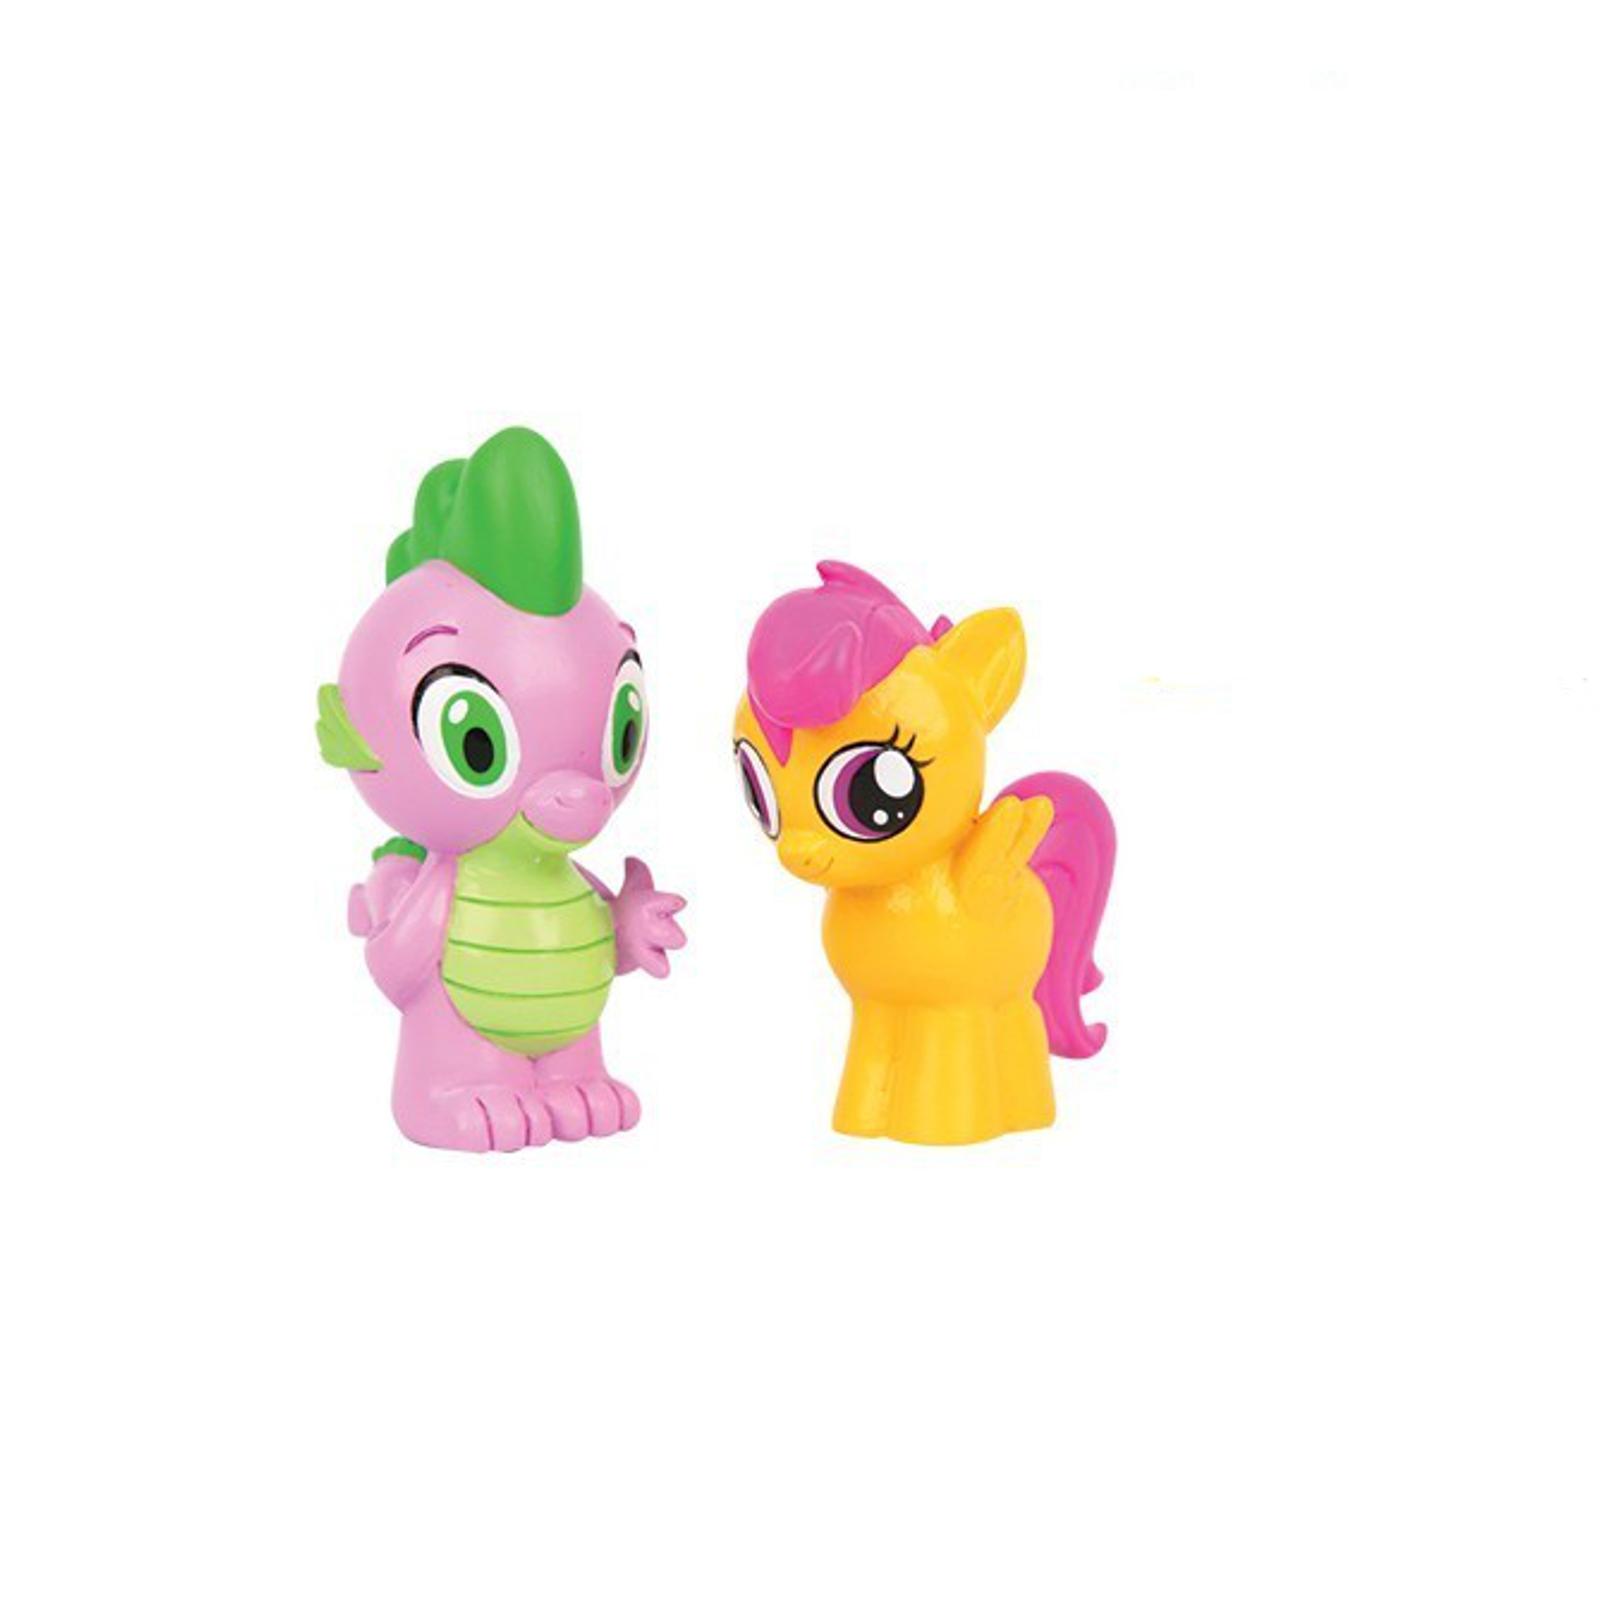 Фигурка My Little Pony Друзья Пони 2 шт. (в сетке)<br>